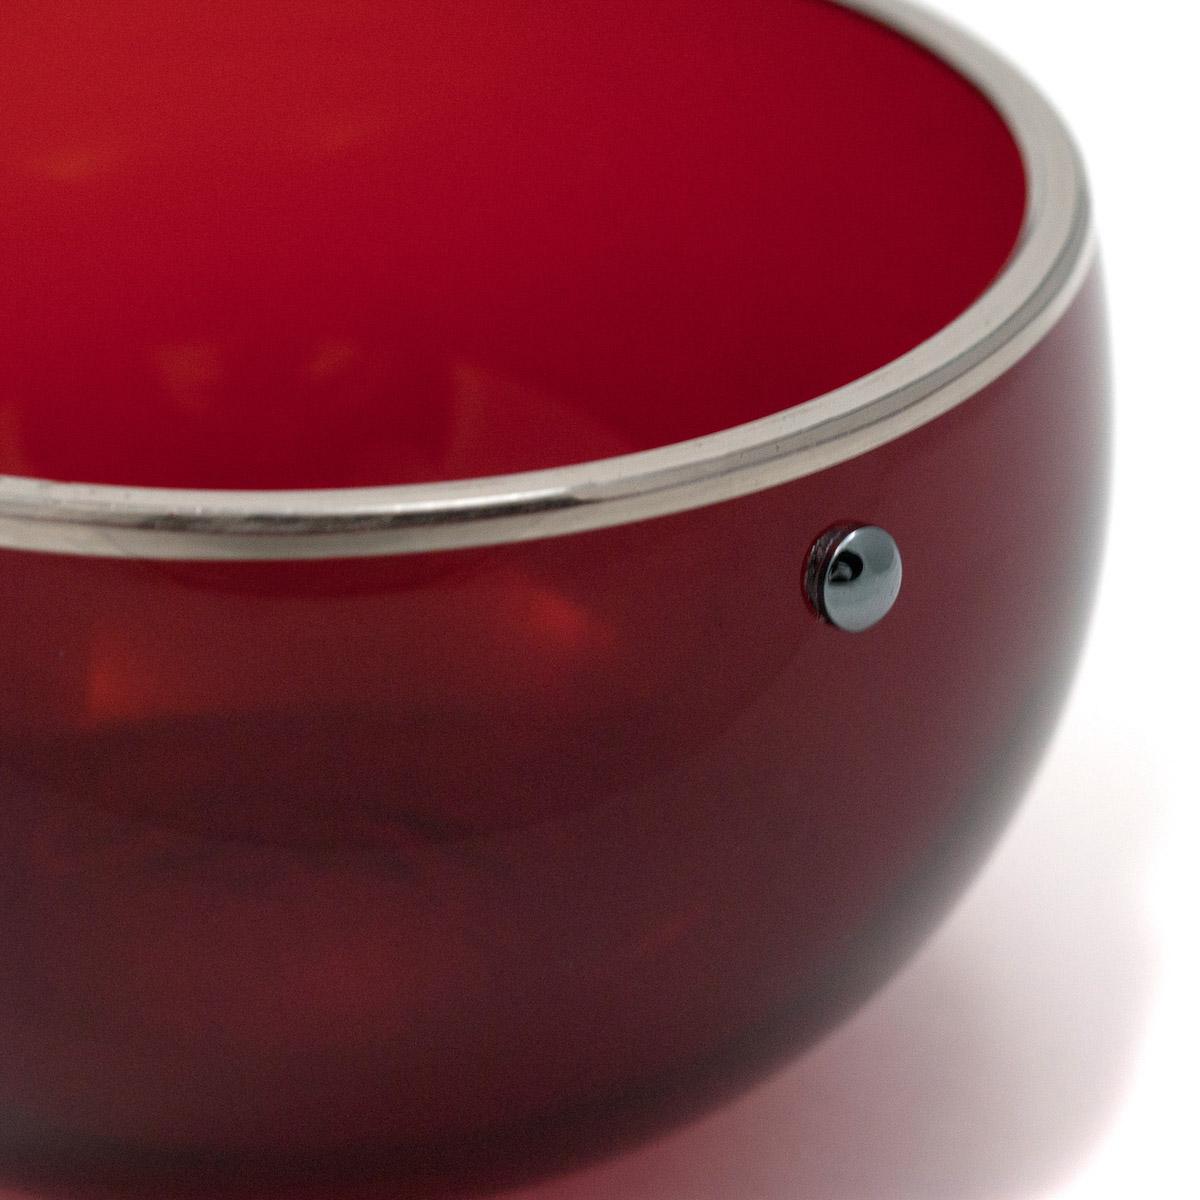 jai-red-cup-bowl-glass-lux-handmade-giberto-designer